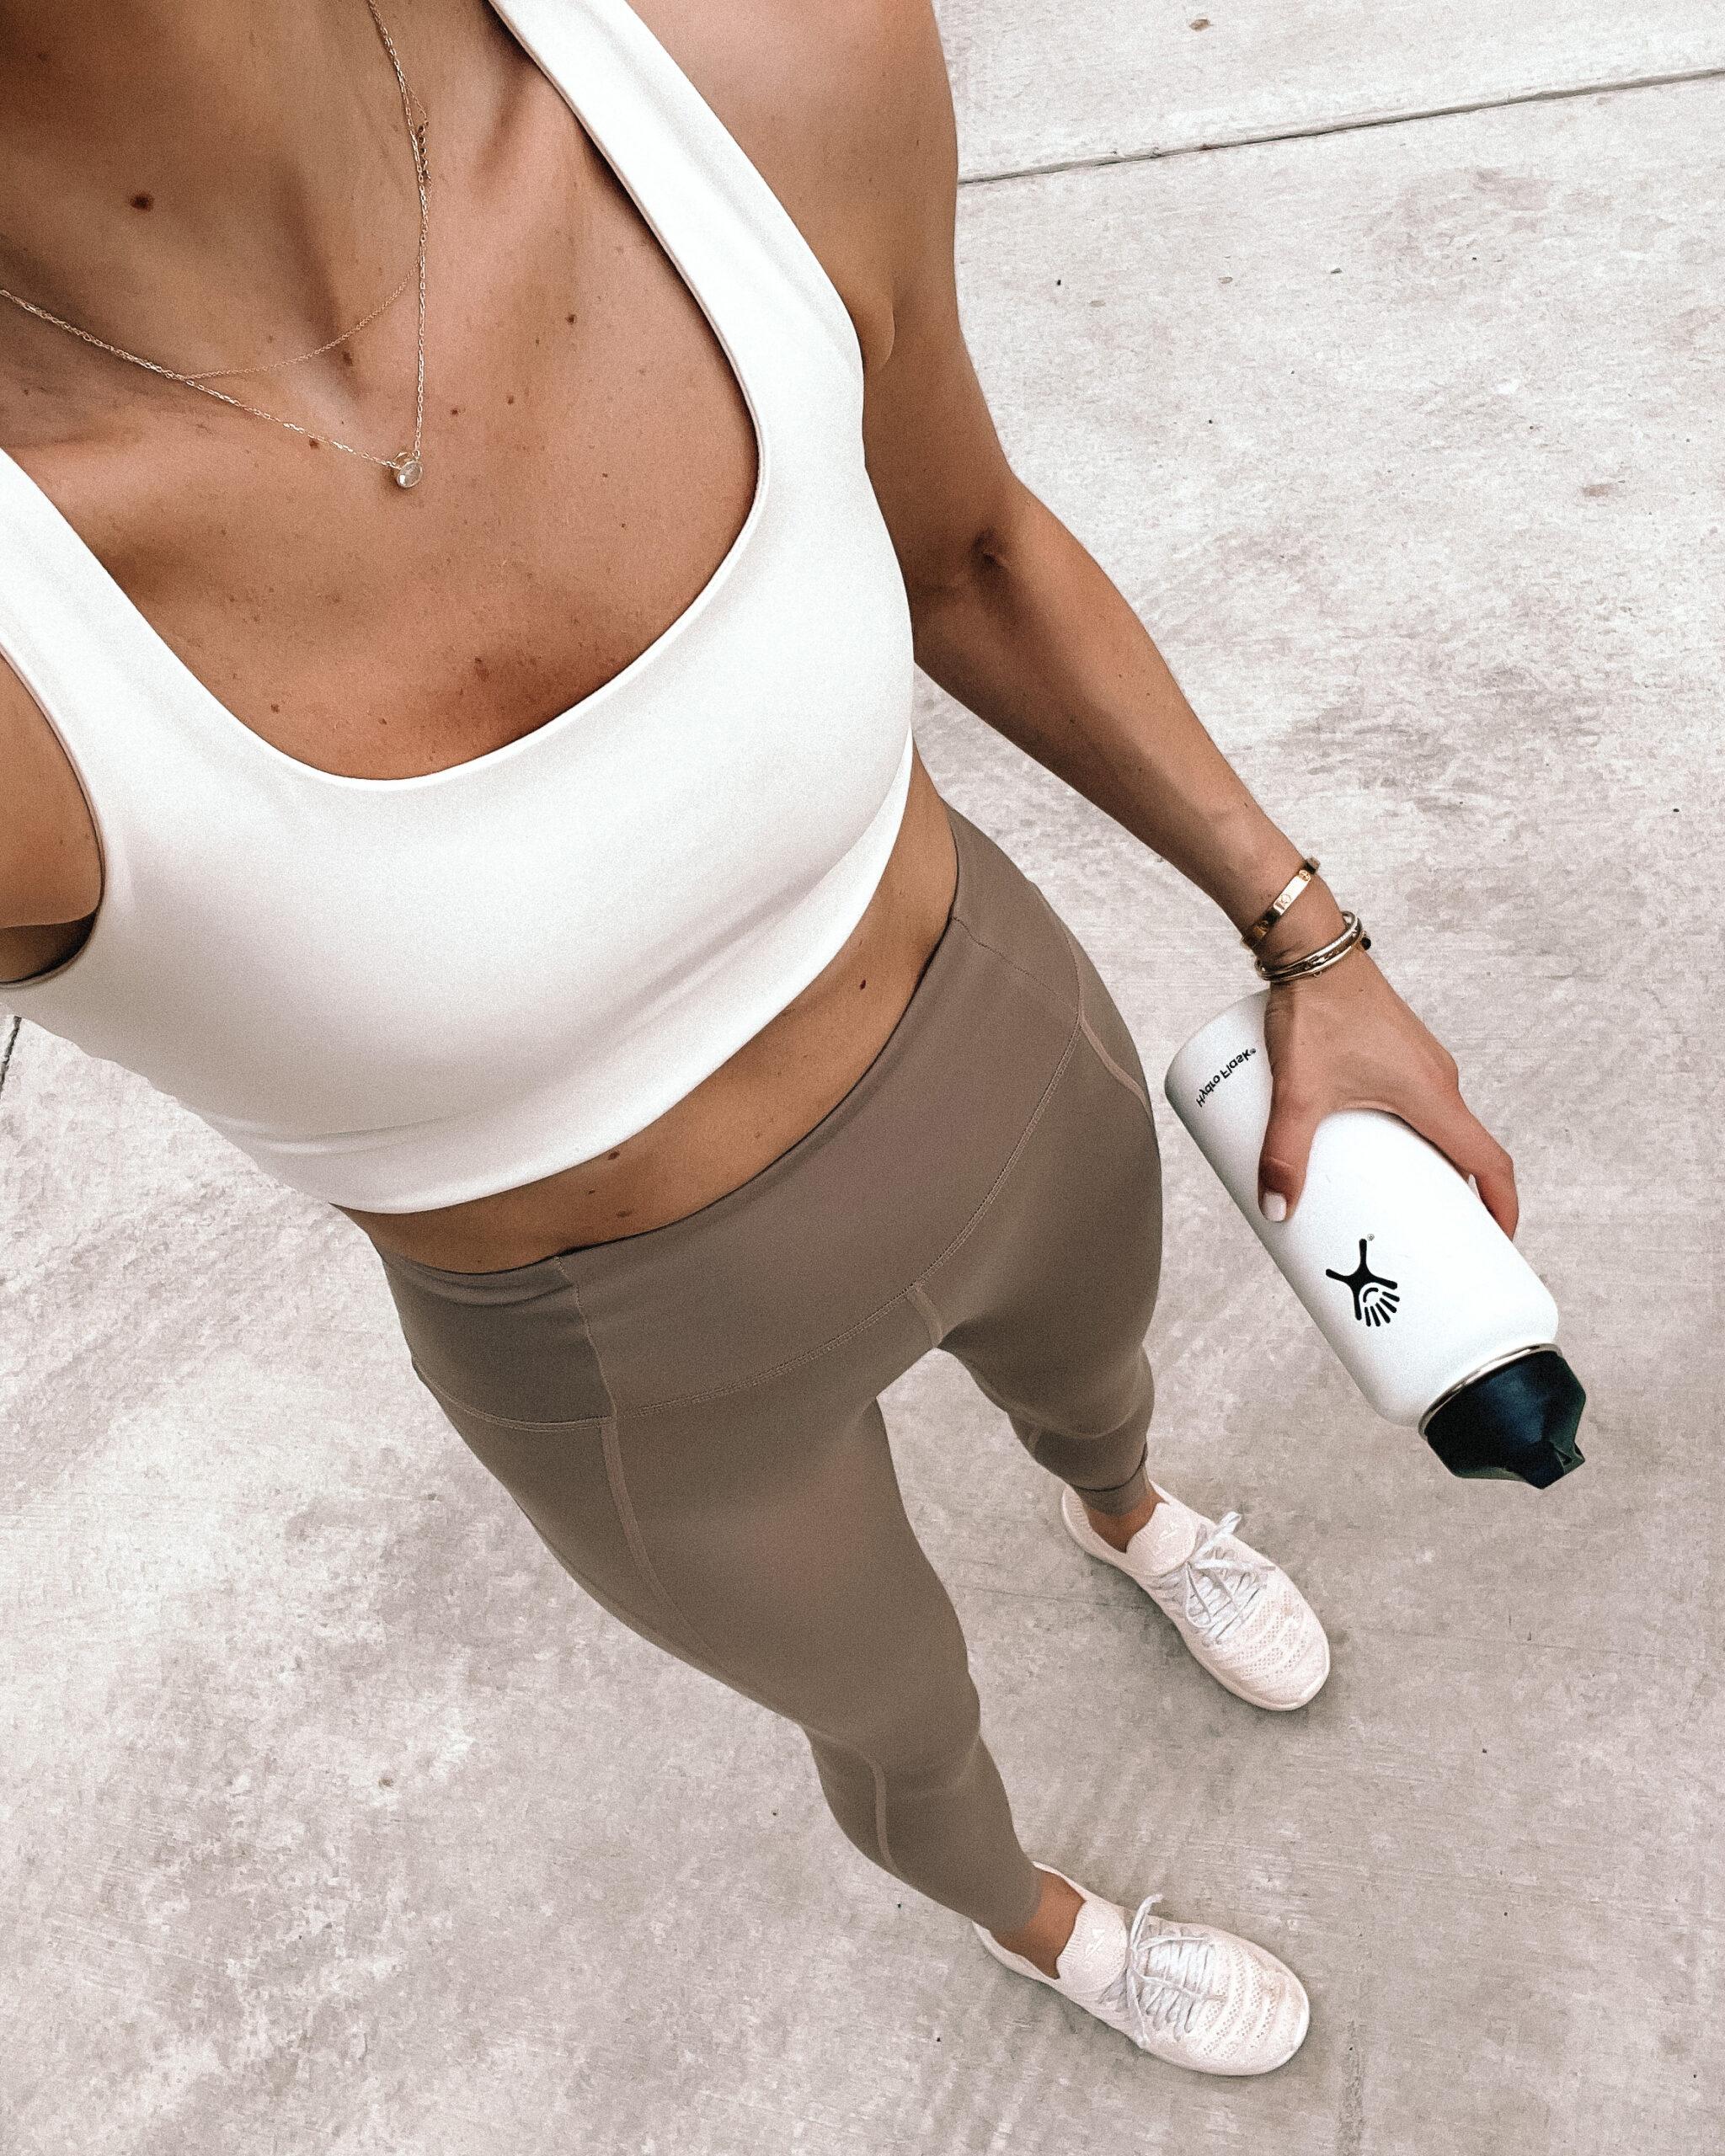 Fashion Jackson Wearing Girlfriend Paloma Sports Bra White Girlfriend High Waist Full Length Leggings Limestone APL Blush Sneakers White Hydroflask Womens Workout Outfit